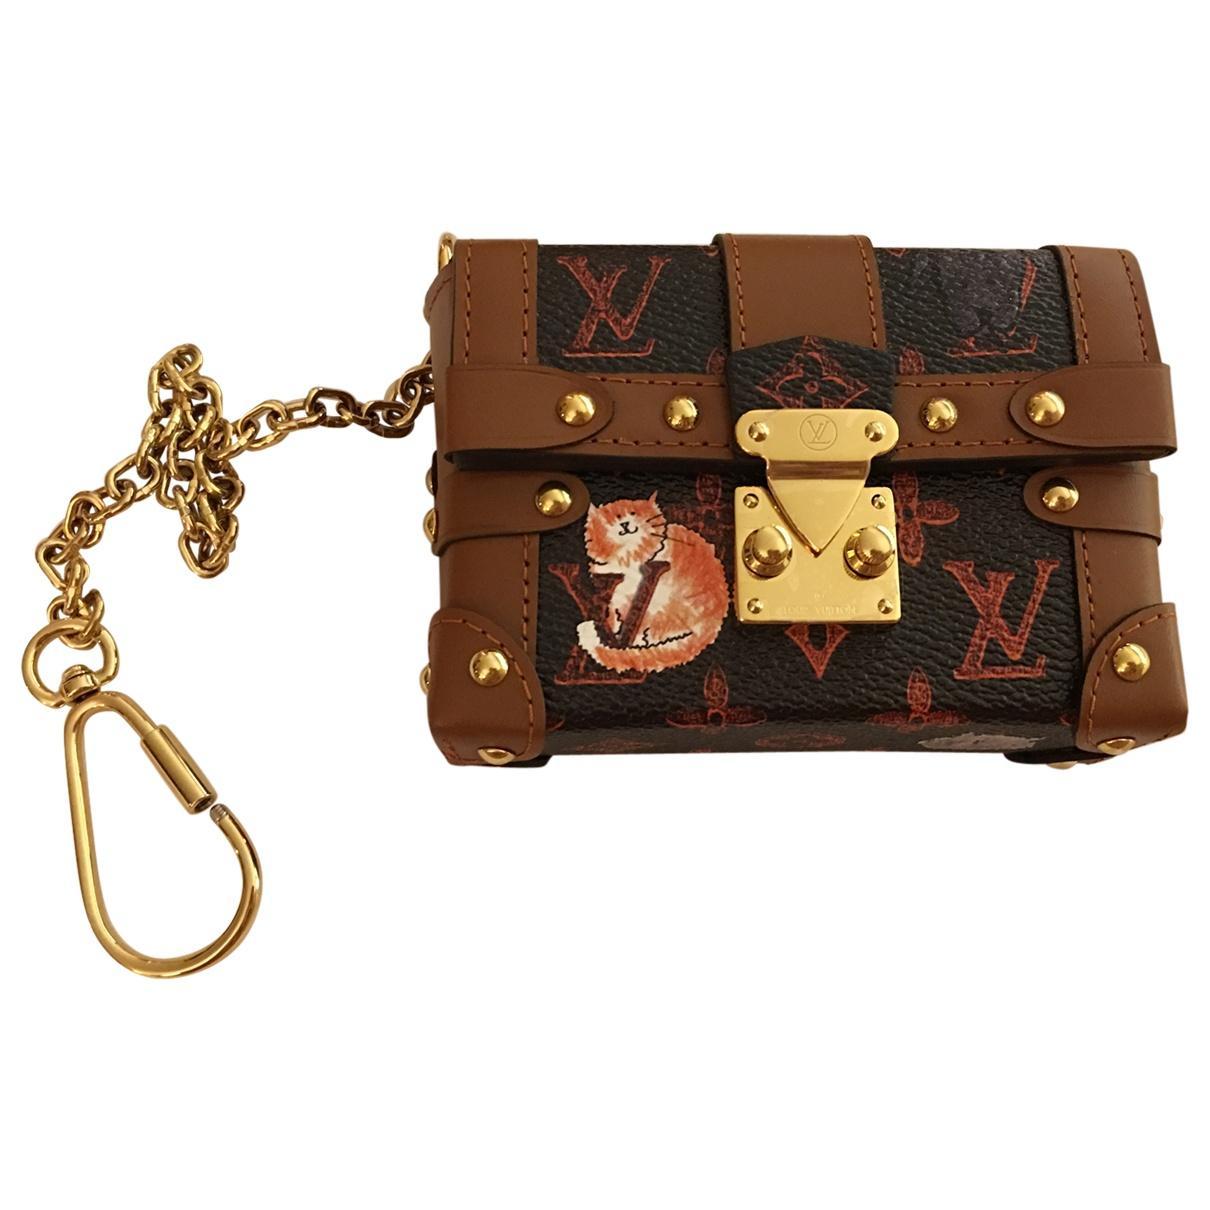 b64e9adb15dc Lyst - Louis Vuitton Essential Trunk Cloth Clutch Bag in Brown